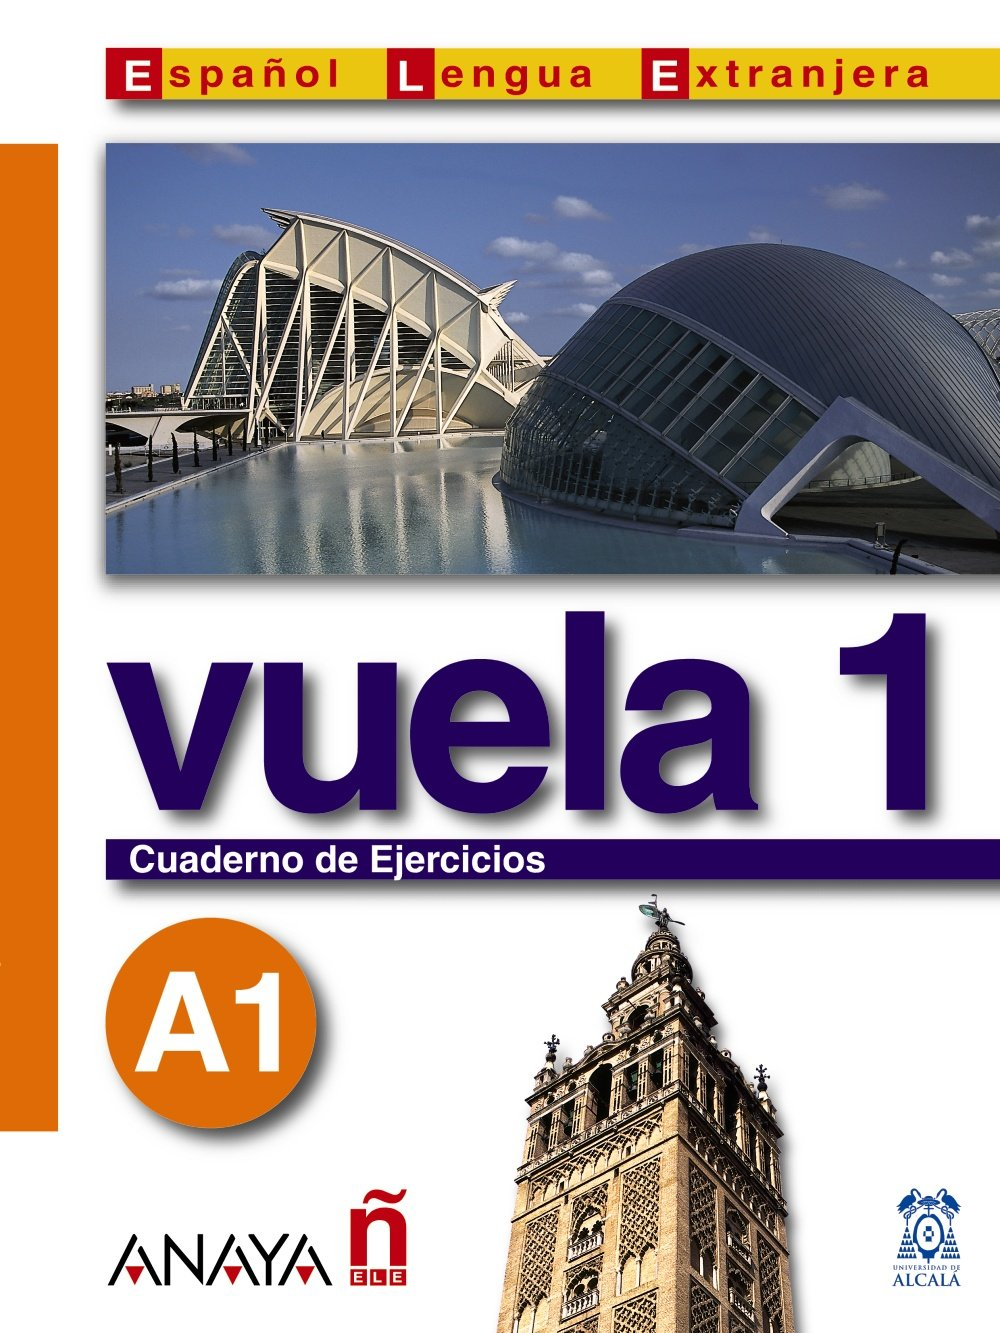 Vuela 1 / Fly 1: Cuaderno de ejercicios A1 / Workbook A1 (Espanol Lengua Extranjera / Spanish As Foreign Language) (Spanish Edition) pdf epub